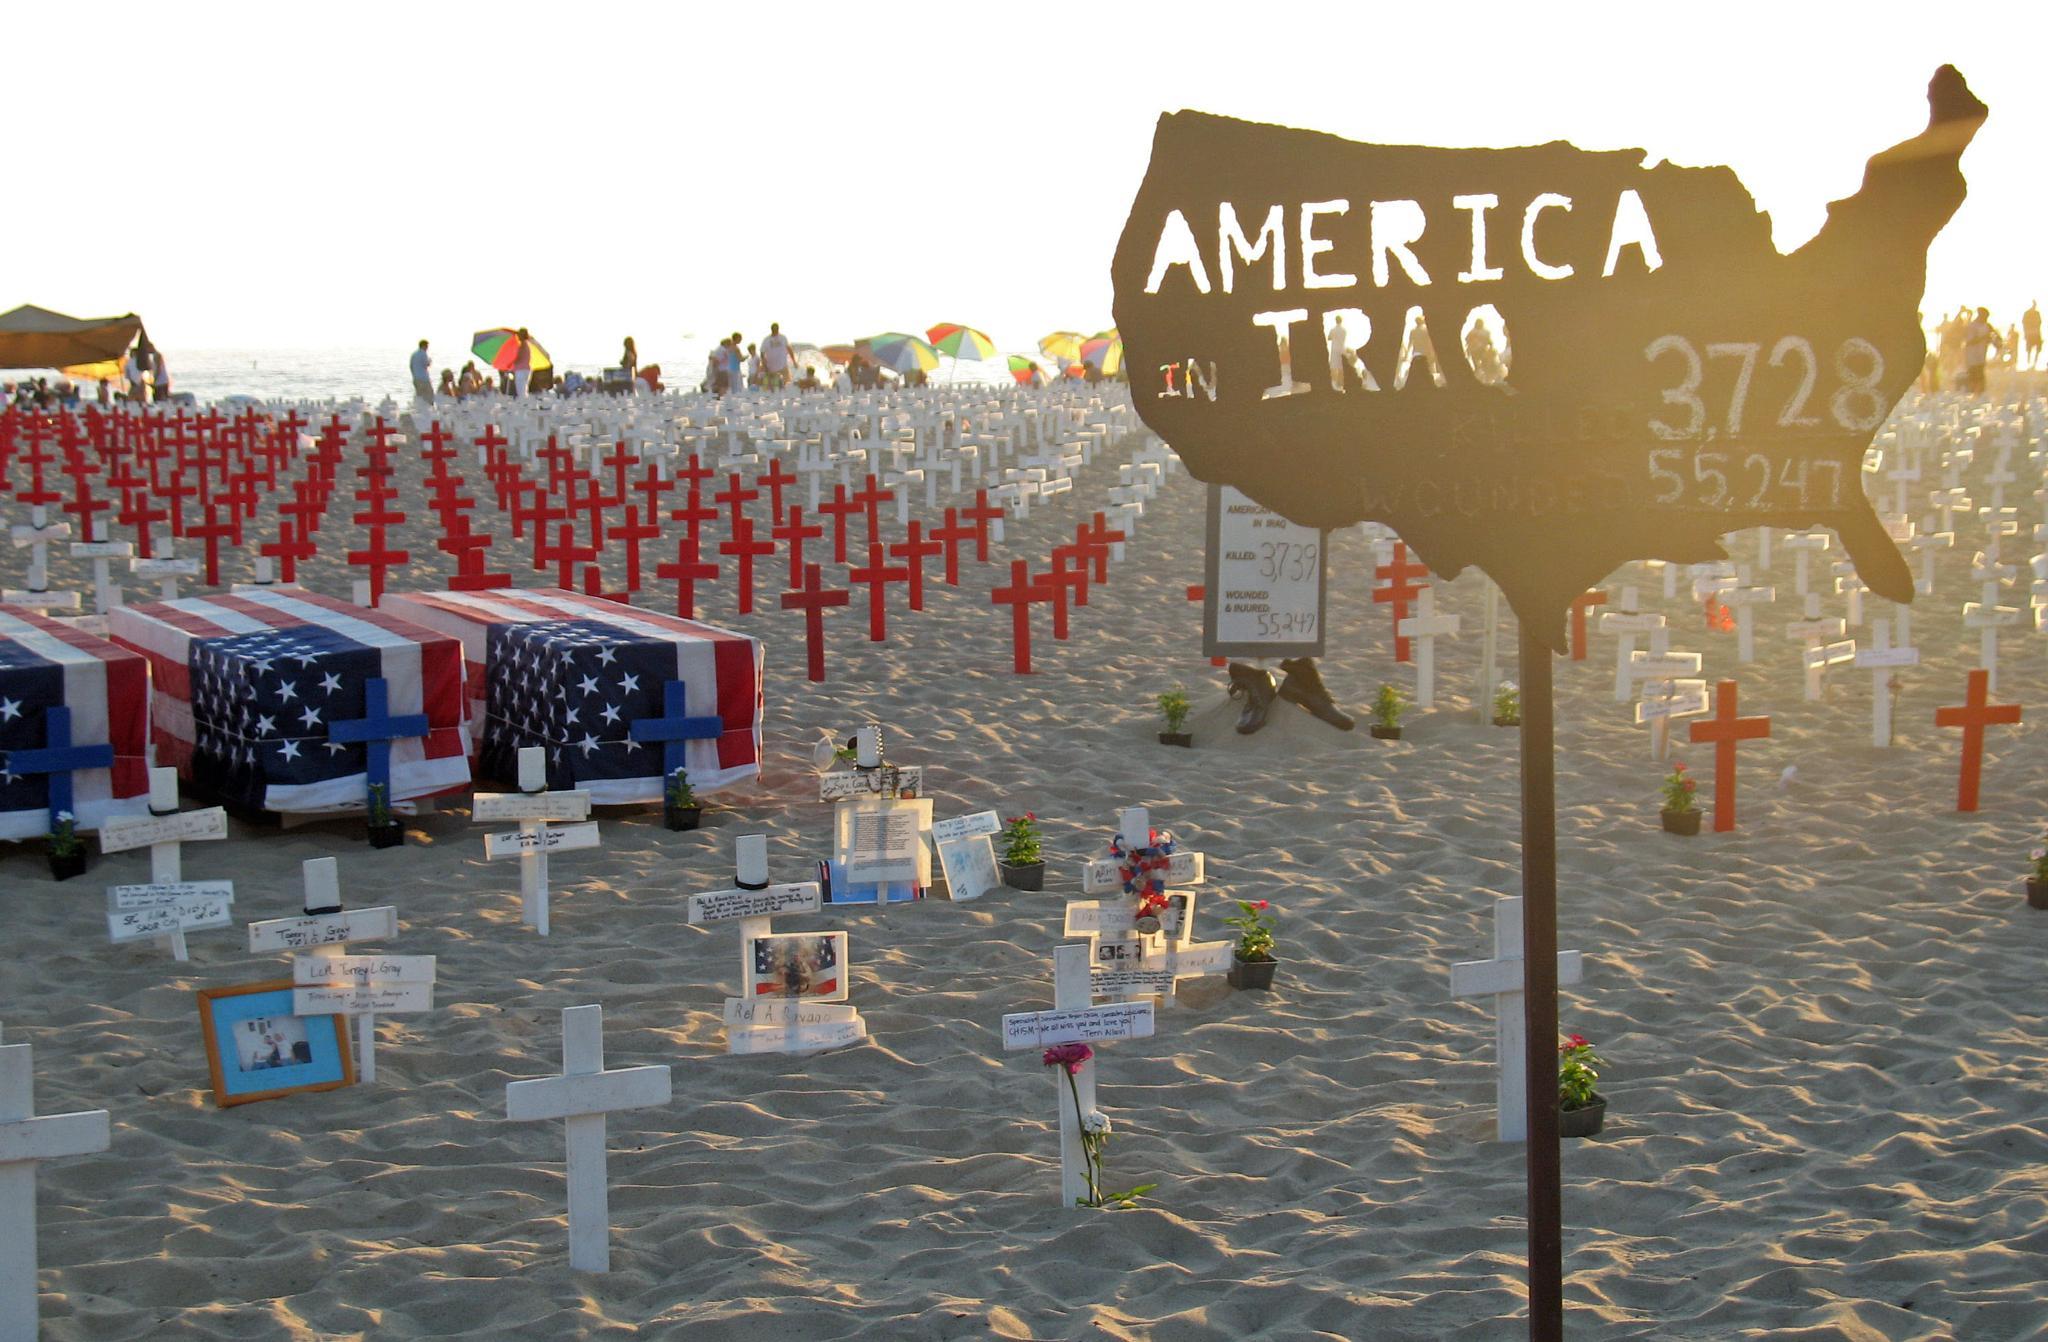 America in Iraq by Betty's View